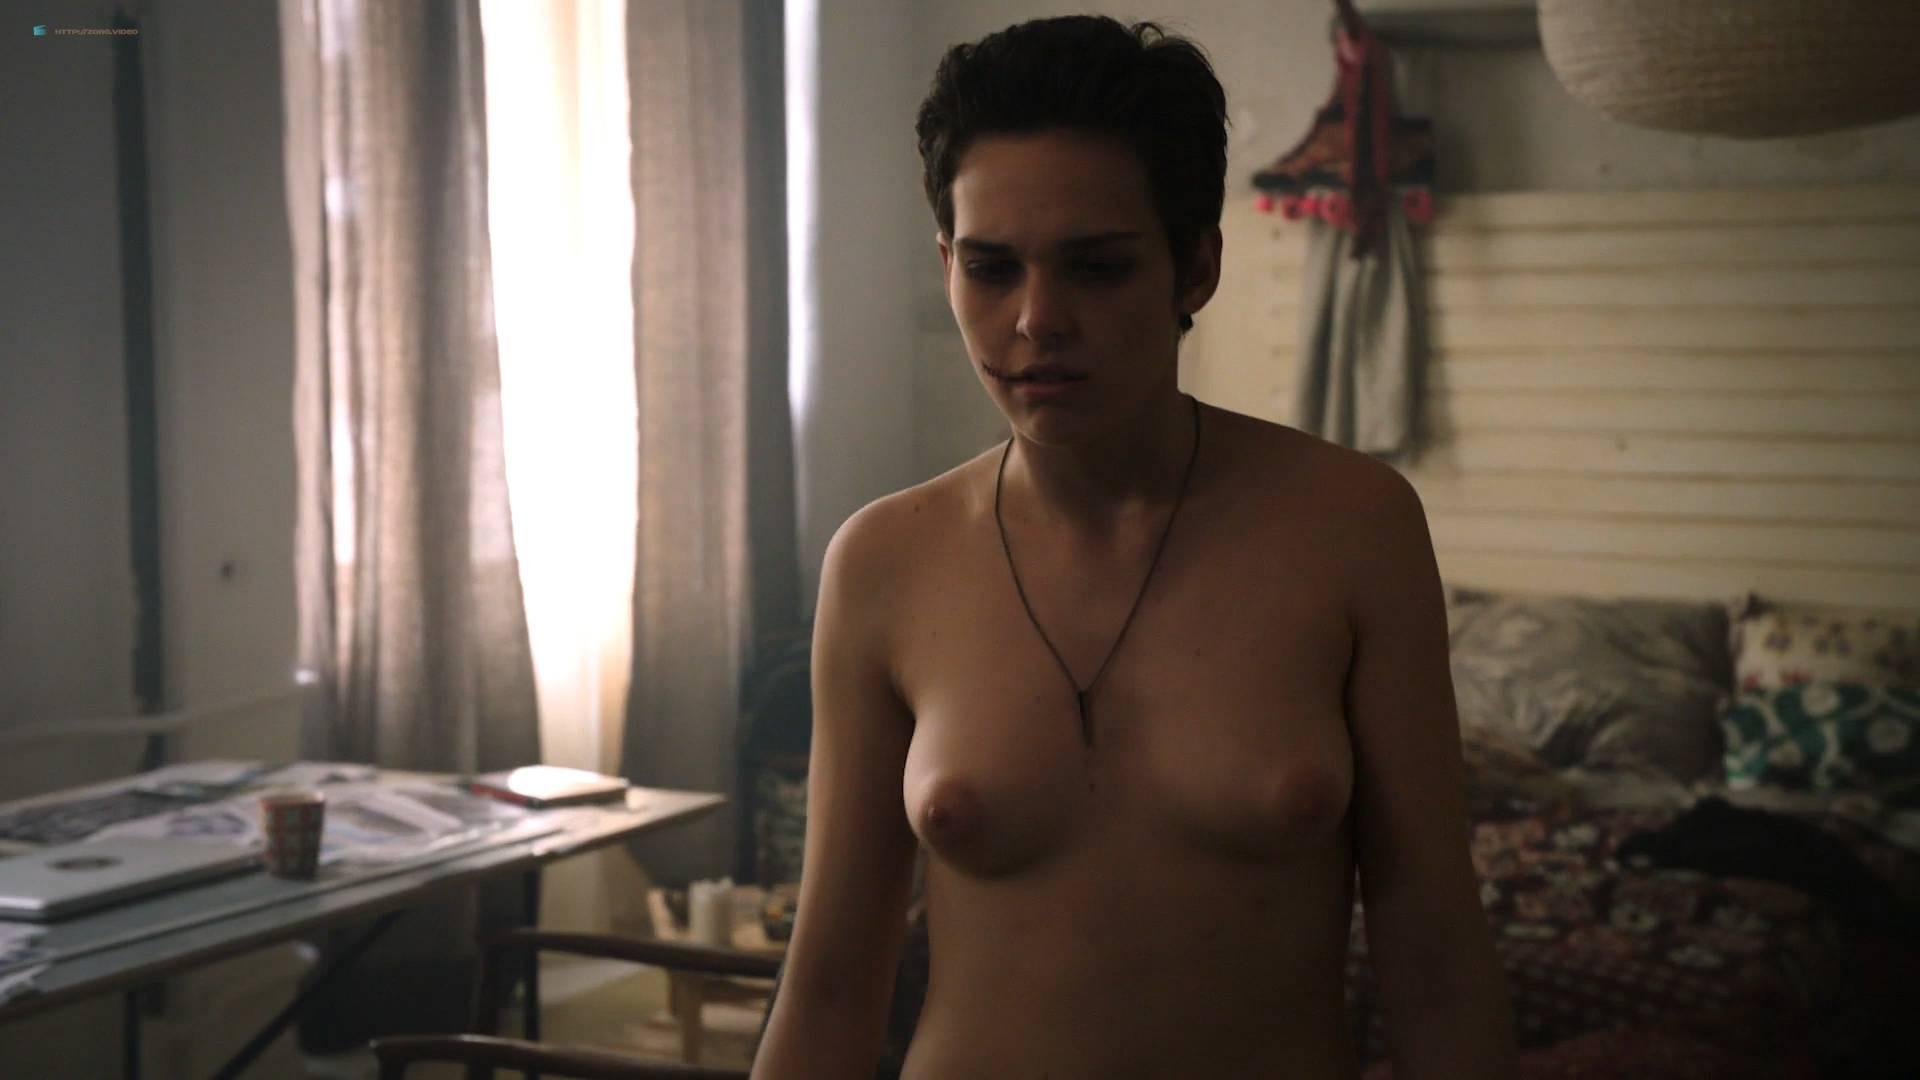 Liv-Lisa-Fries-nude-topless-Sara-Serraiocco-nude-topless-lesbian-sex-Counterpart-2018-s1e6-HD-1080p-Web-007.jpg